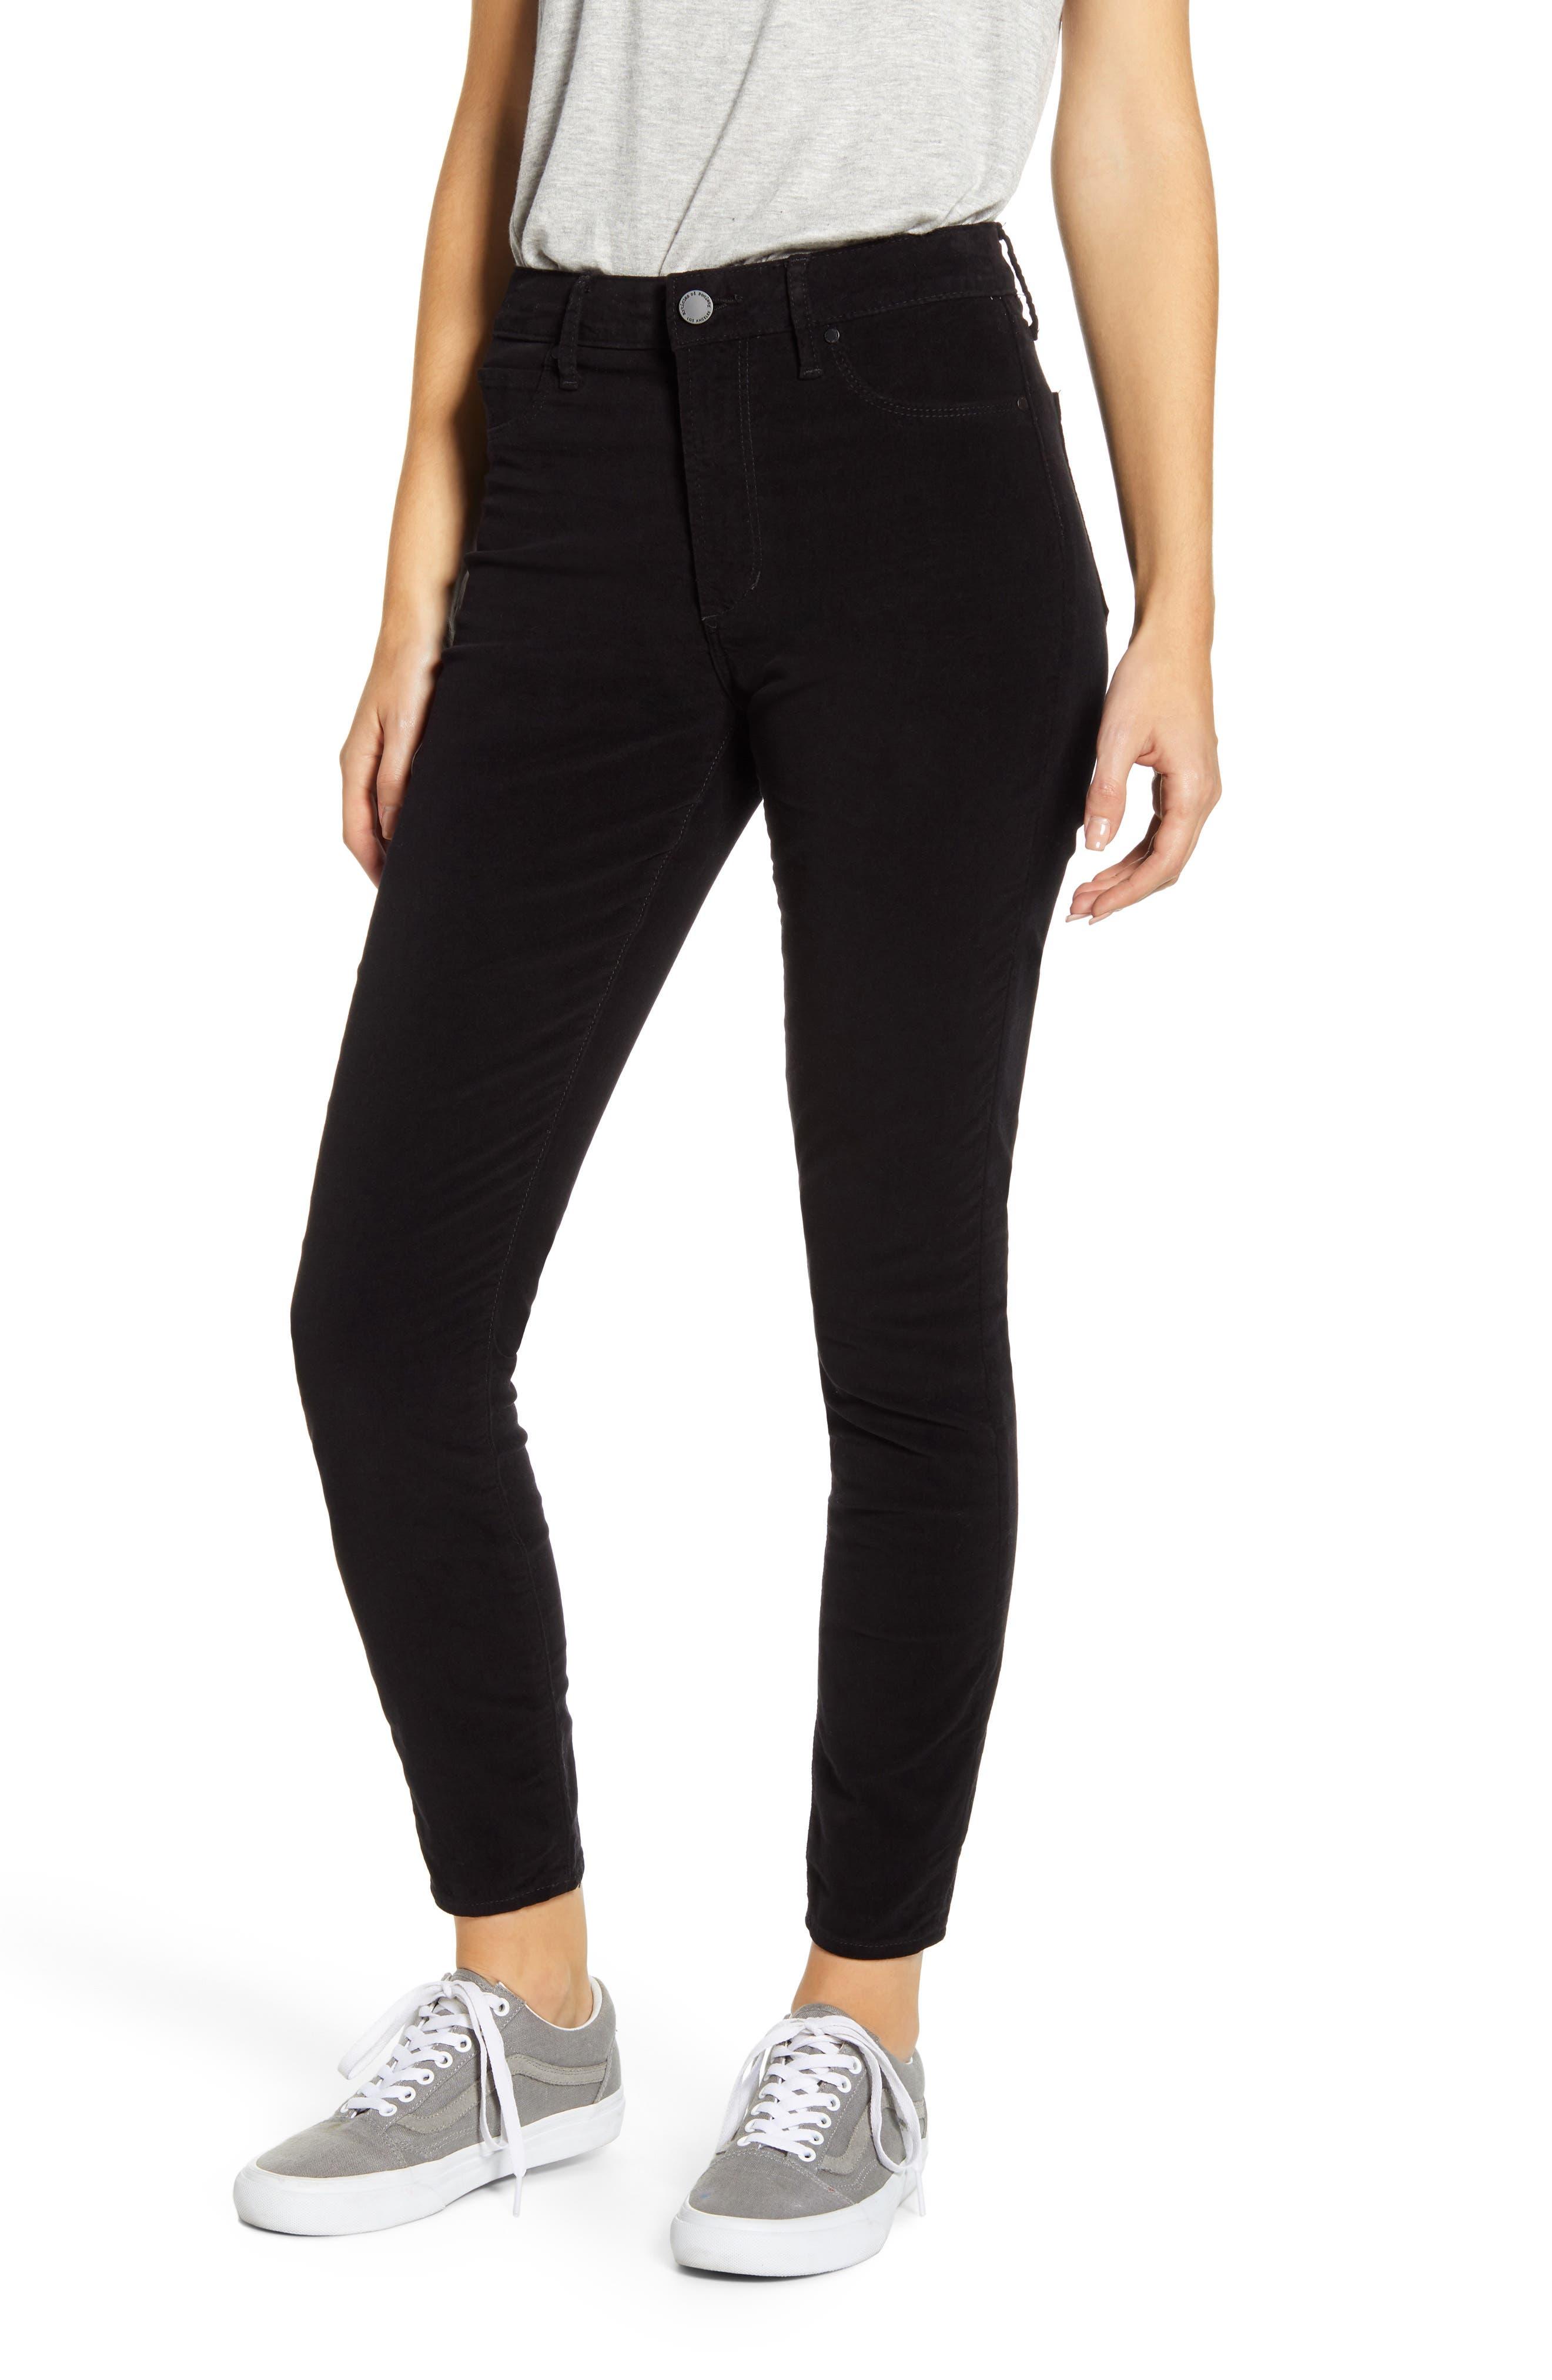 Image of Articles of Society Hilary High Waist Ankle Velveteen Skinny Jeans